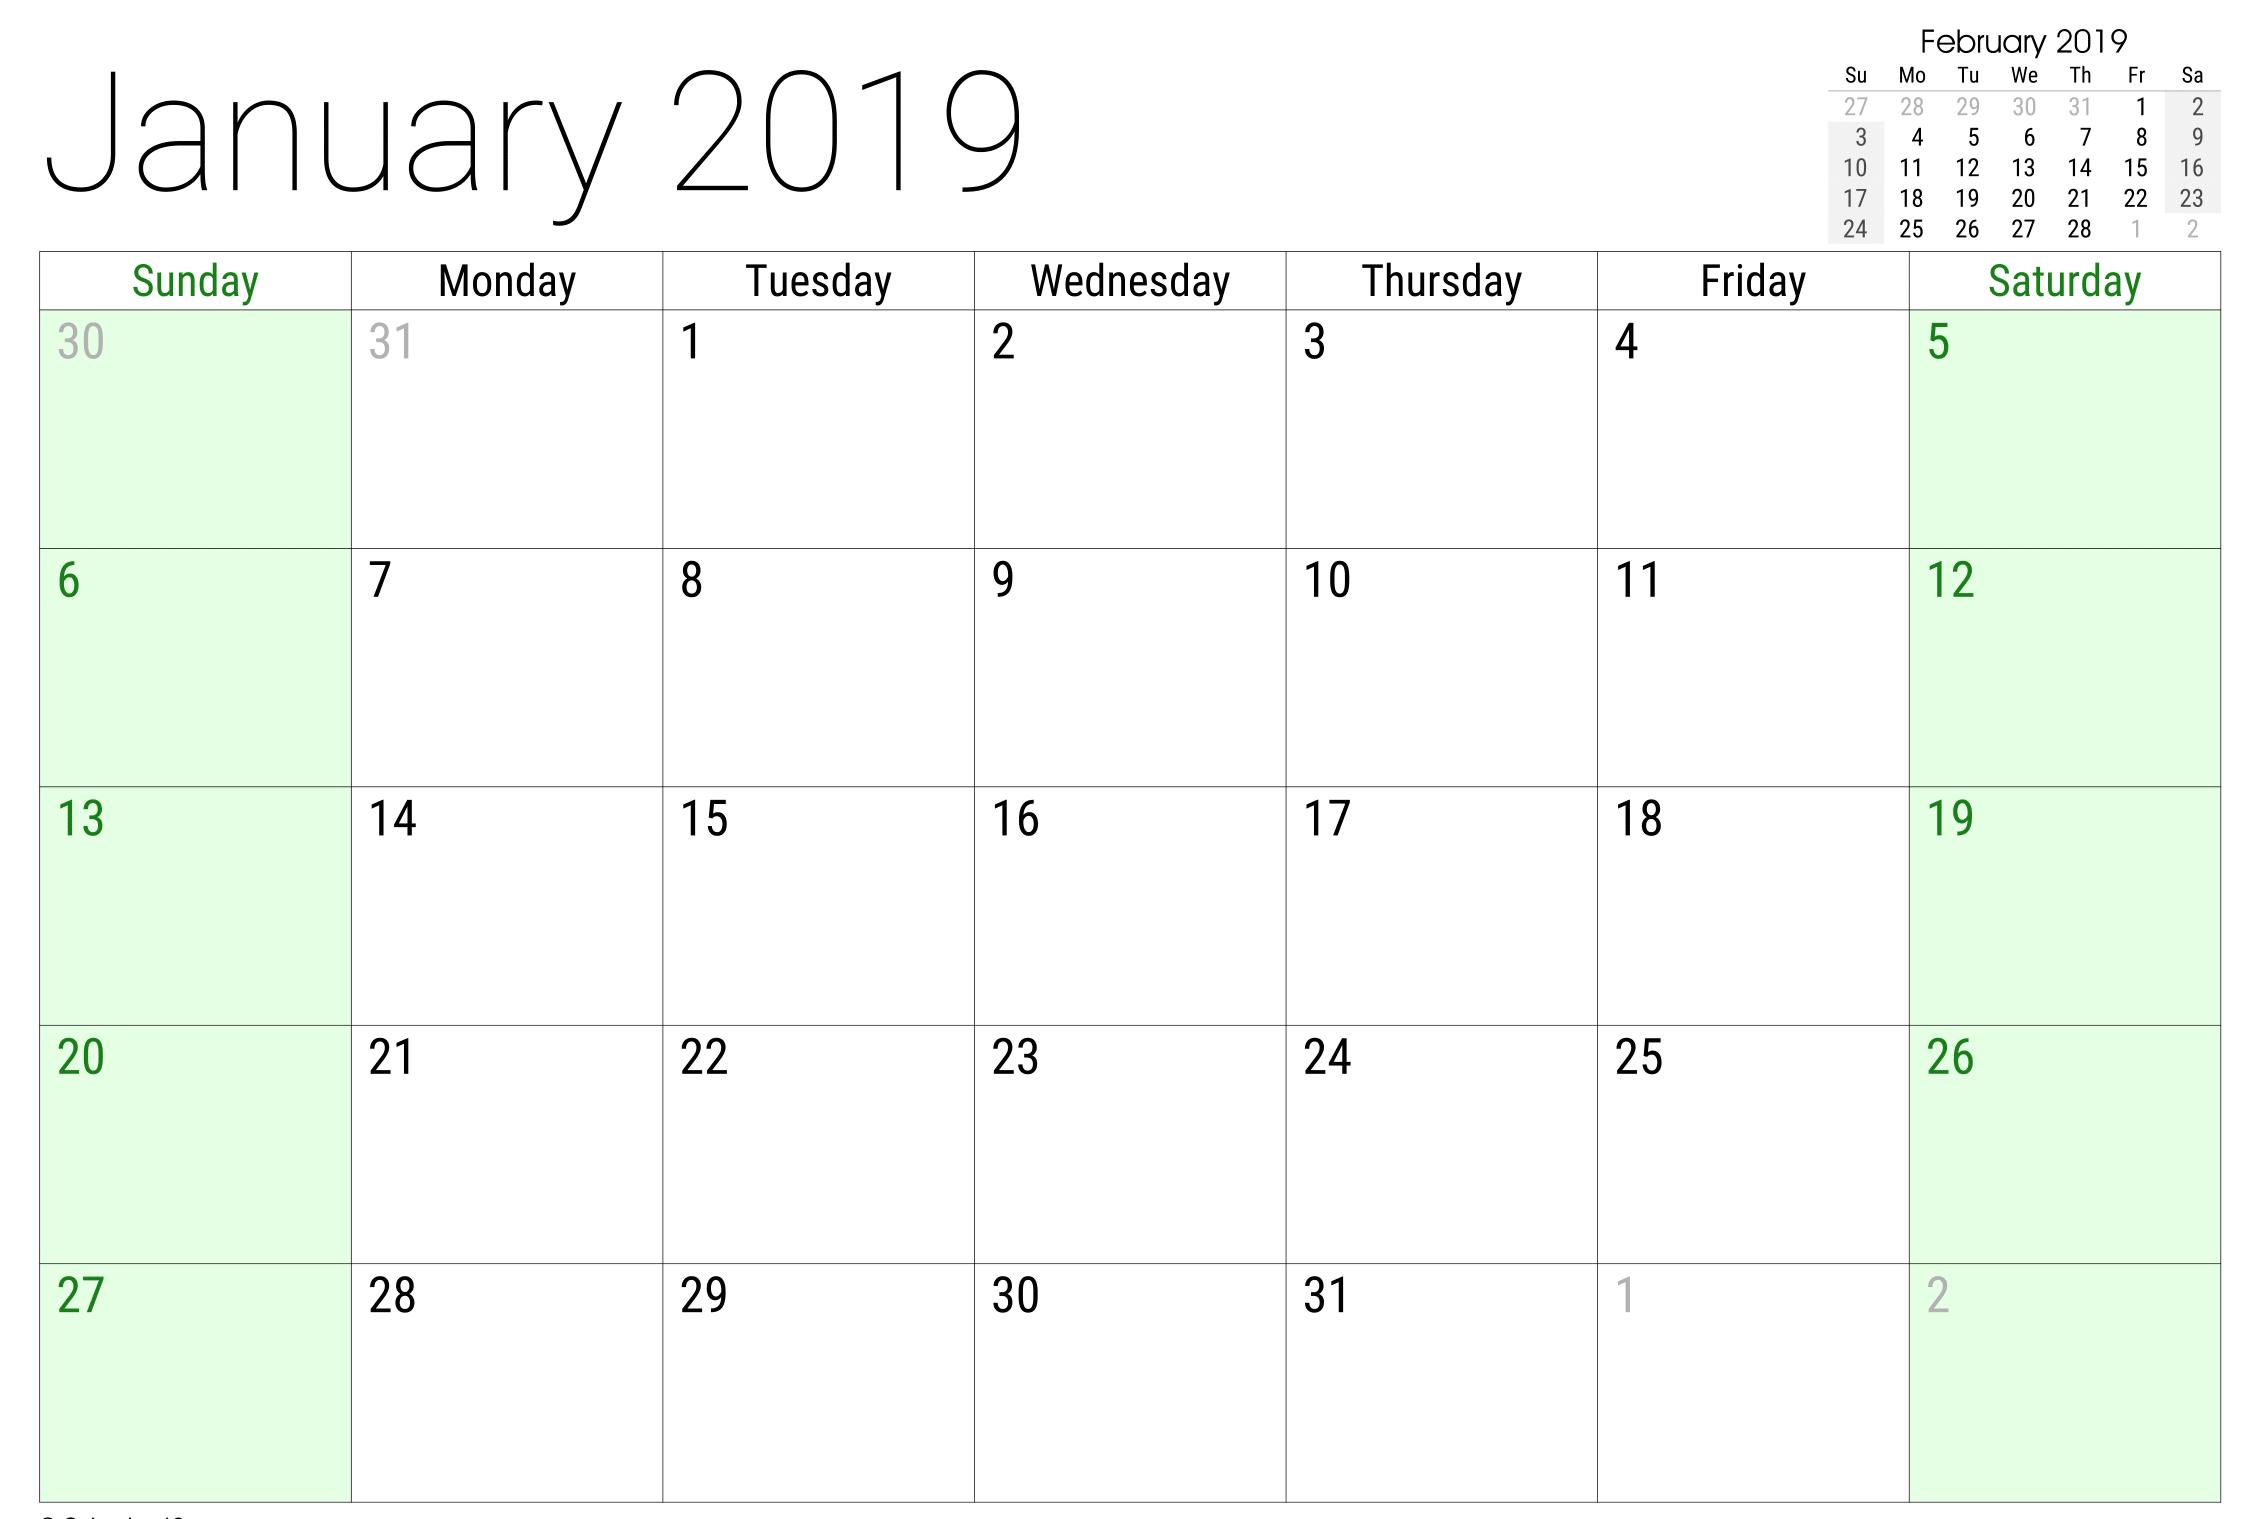 January 2019 Google Sheet Calendar | 2019 Calendars | 2019 Calendar Calendar 2019 Google Sheets